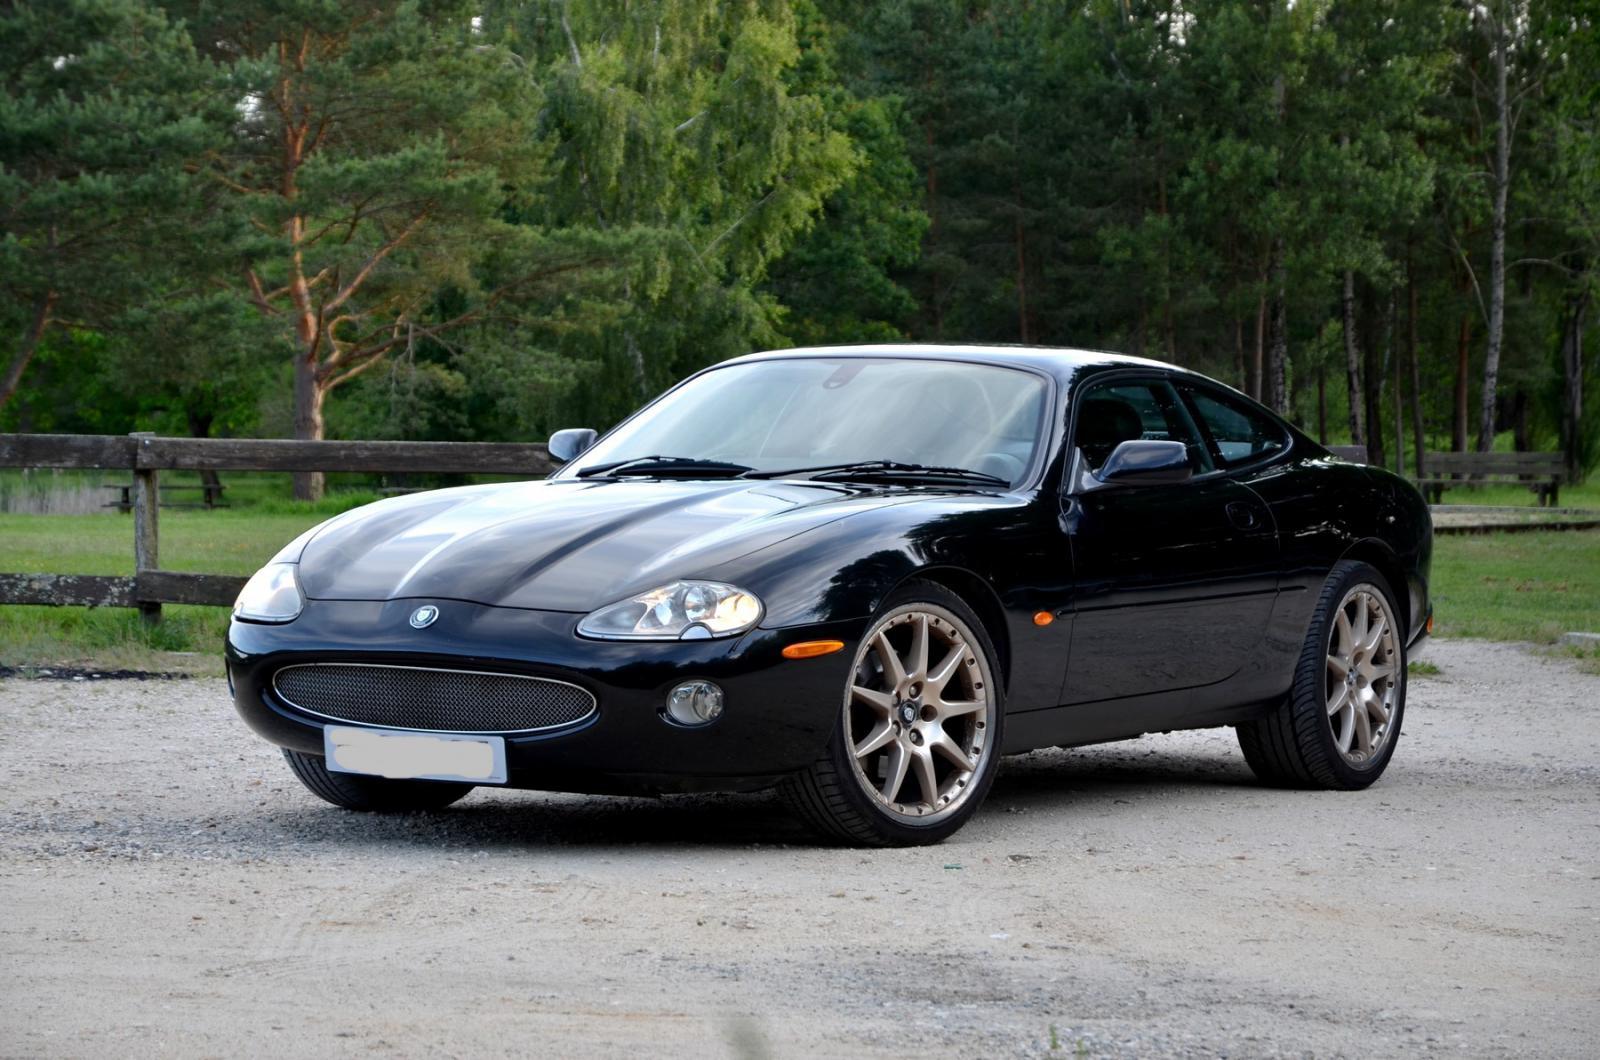 2002 Jaguar XK-X100 XK8 4.0 (244 cui) gasoline 216 kW 394 Nm